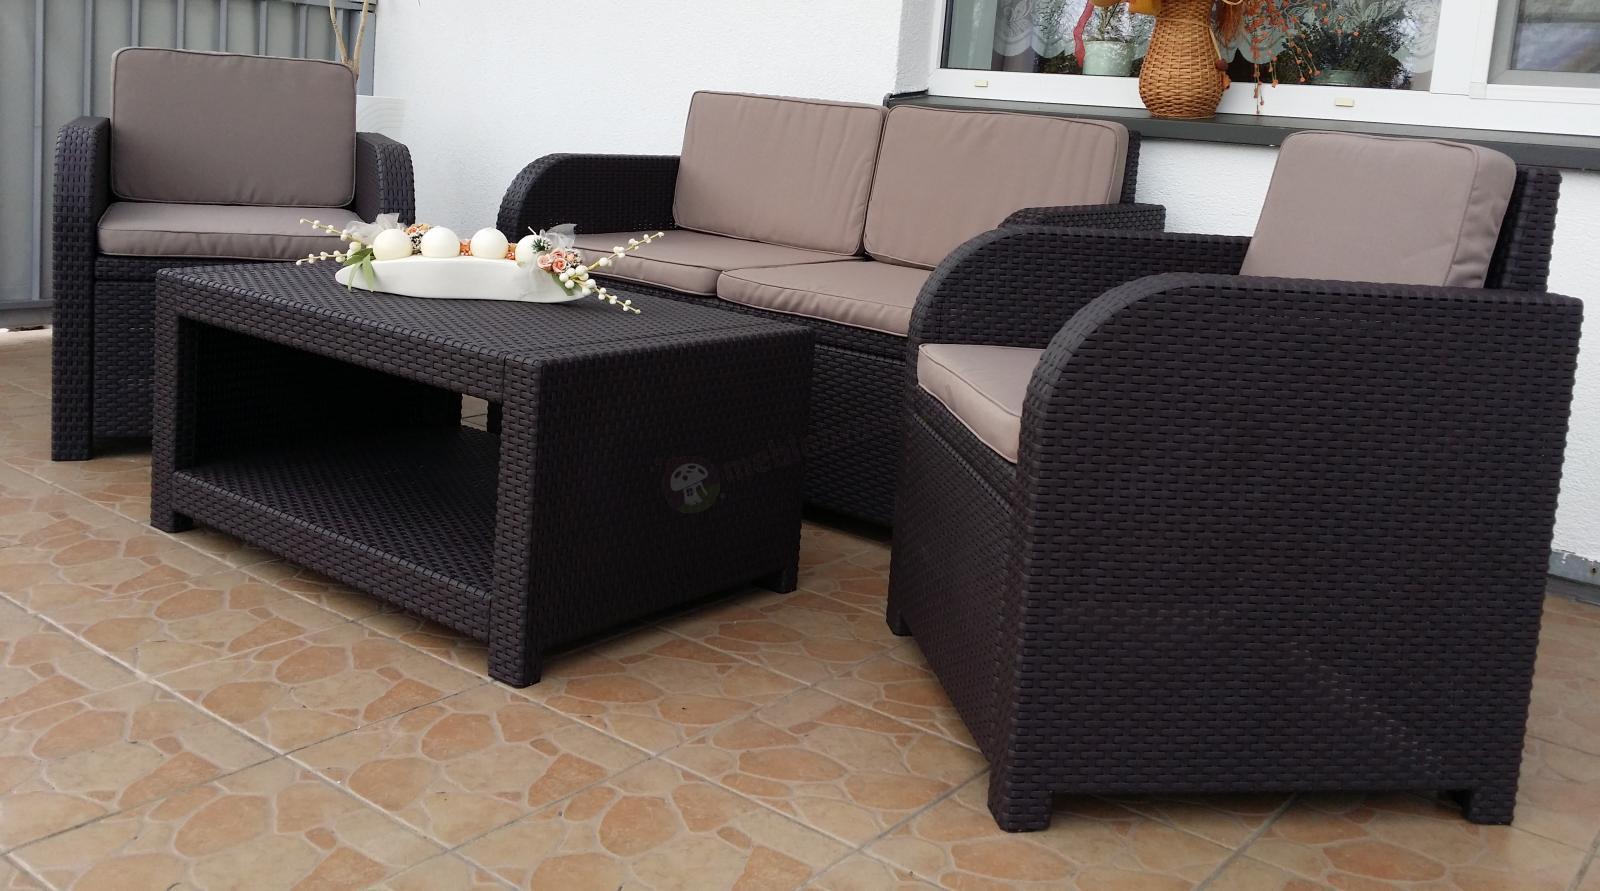 Meble Ogrodowe Zestaw Modena Lounge Set : Zestaw ogrodowy Modena Lounge Set  Meble Ogrodowe